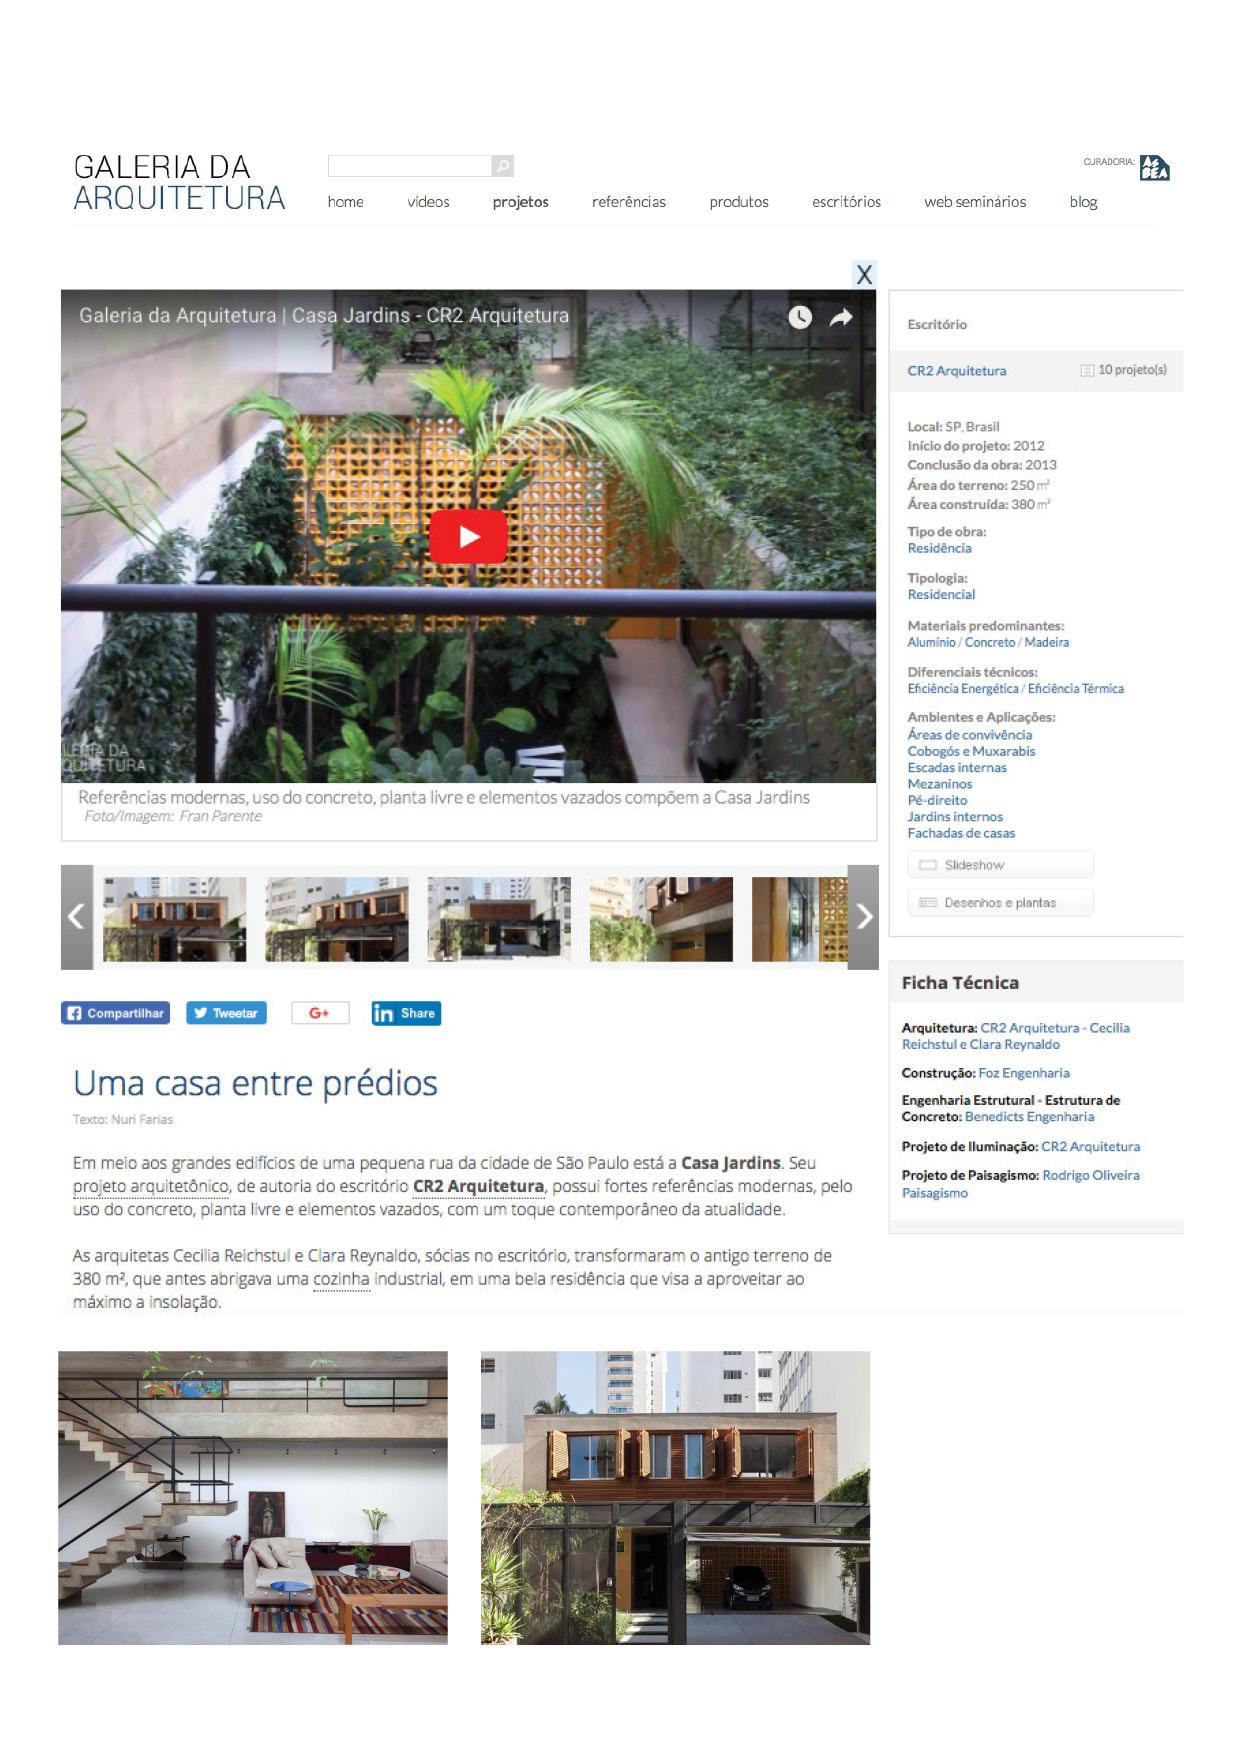 Galeria da Arquitetura | Casa Jardins - março 2018